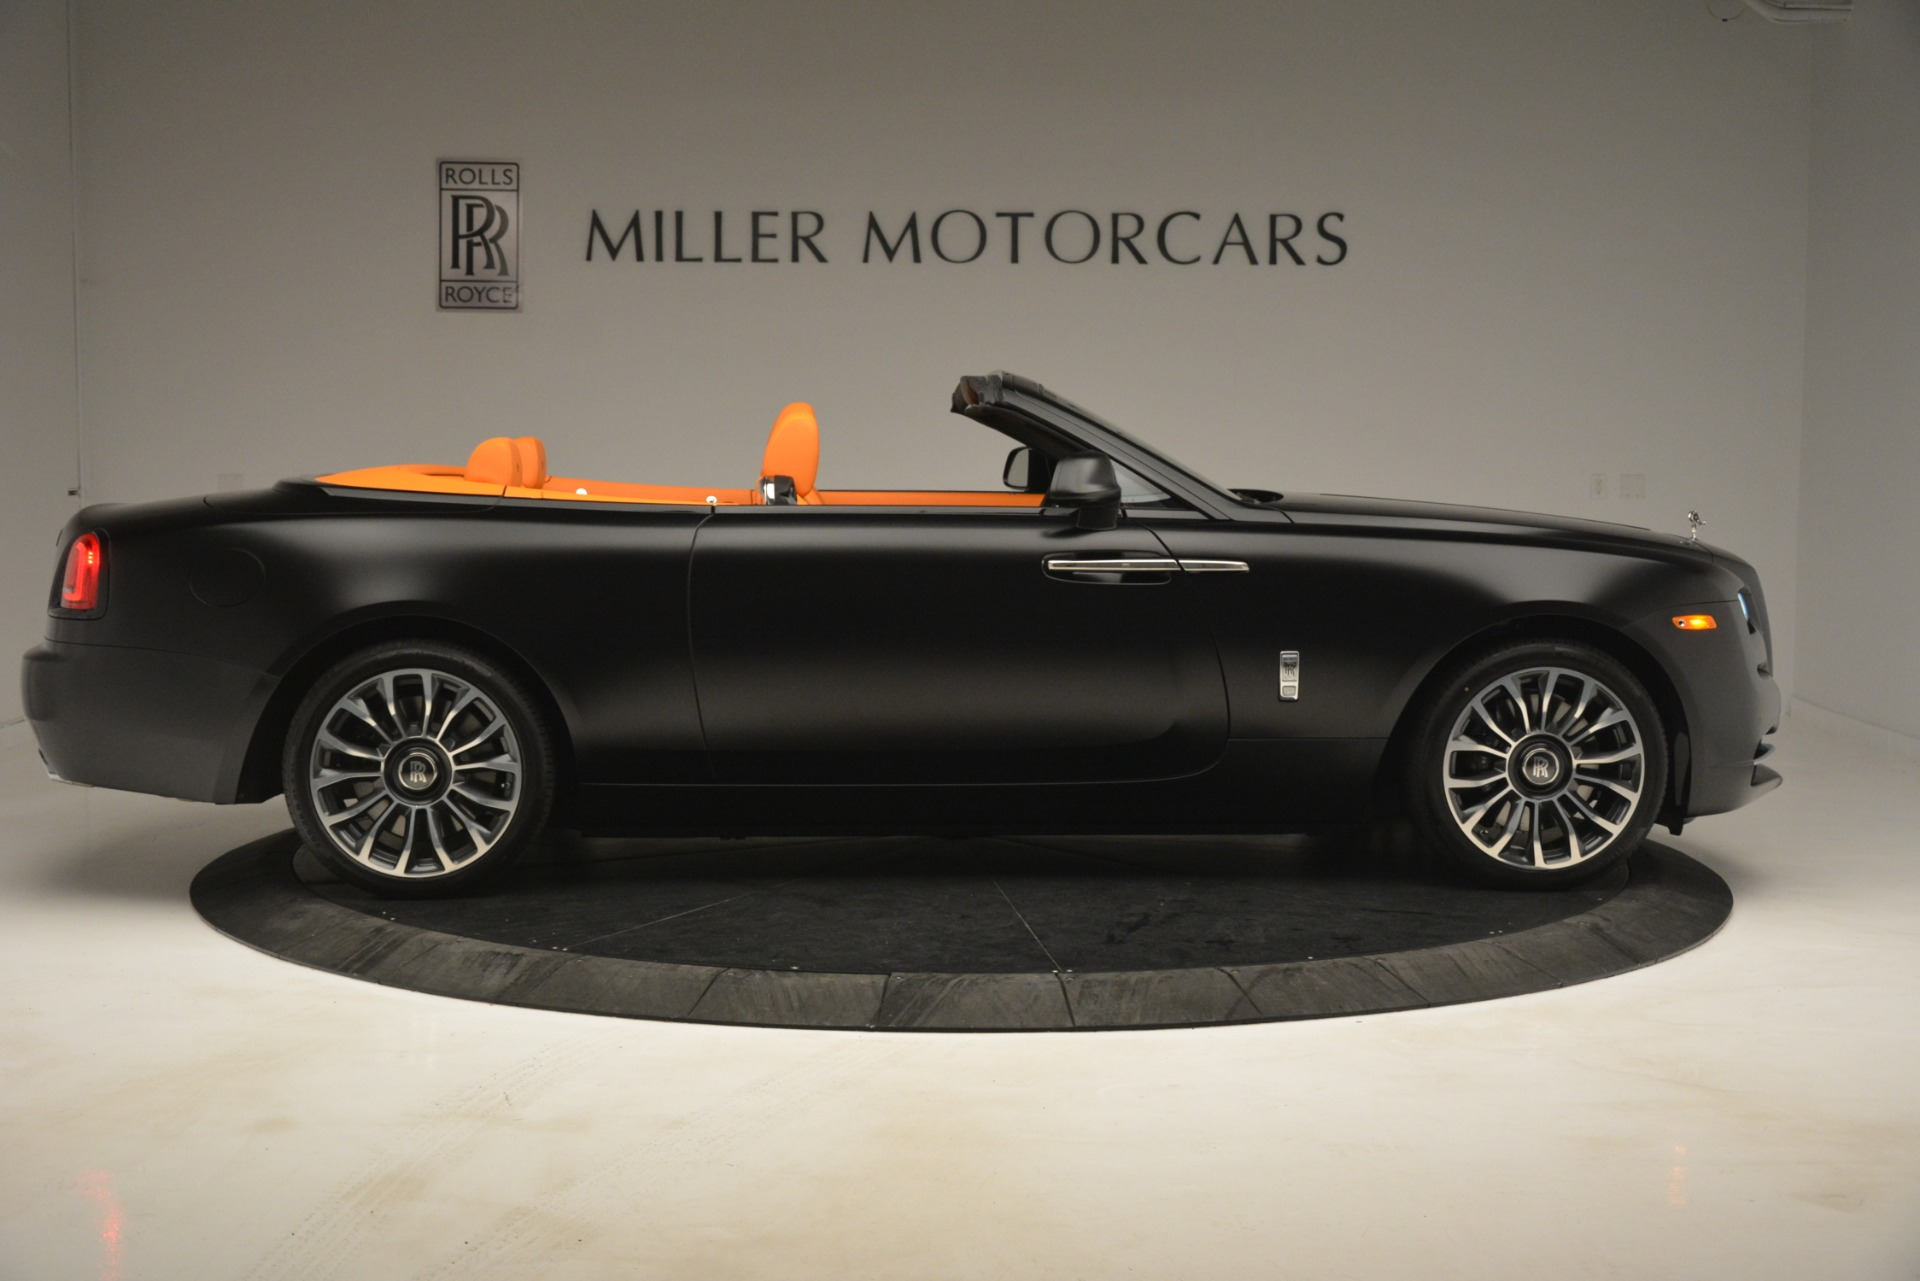 New 2019 Rolls-Royce Dawn  For Sale In Greenwich, CT 2695_p10